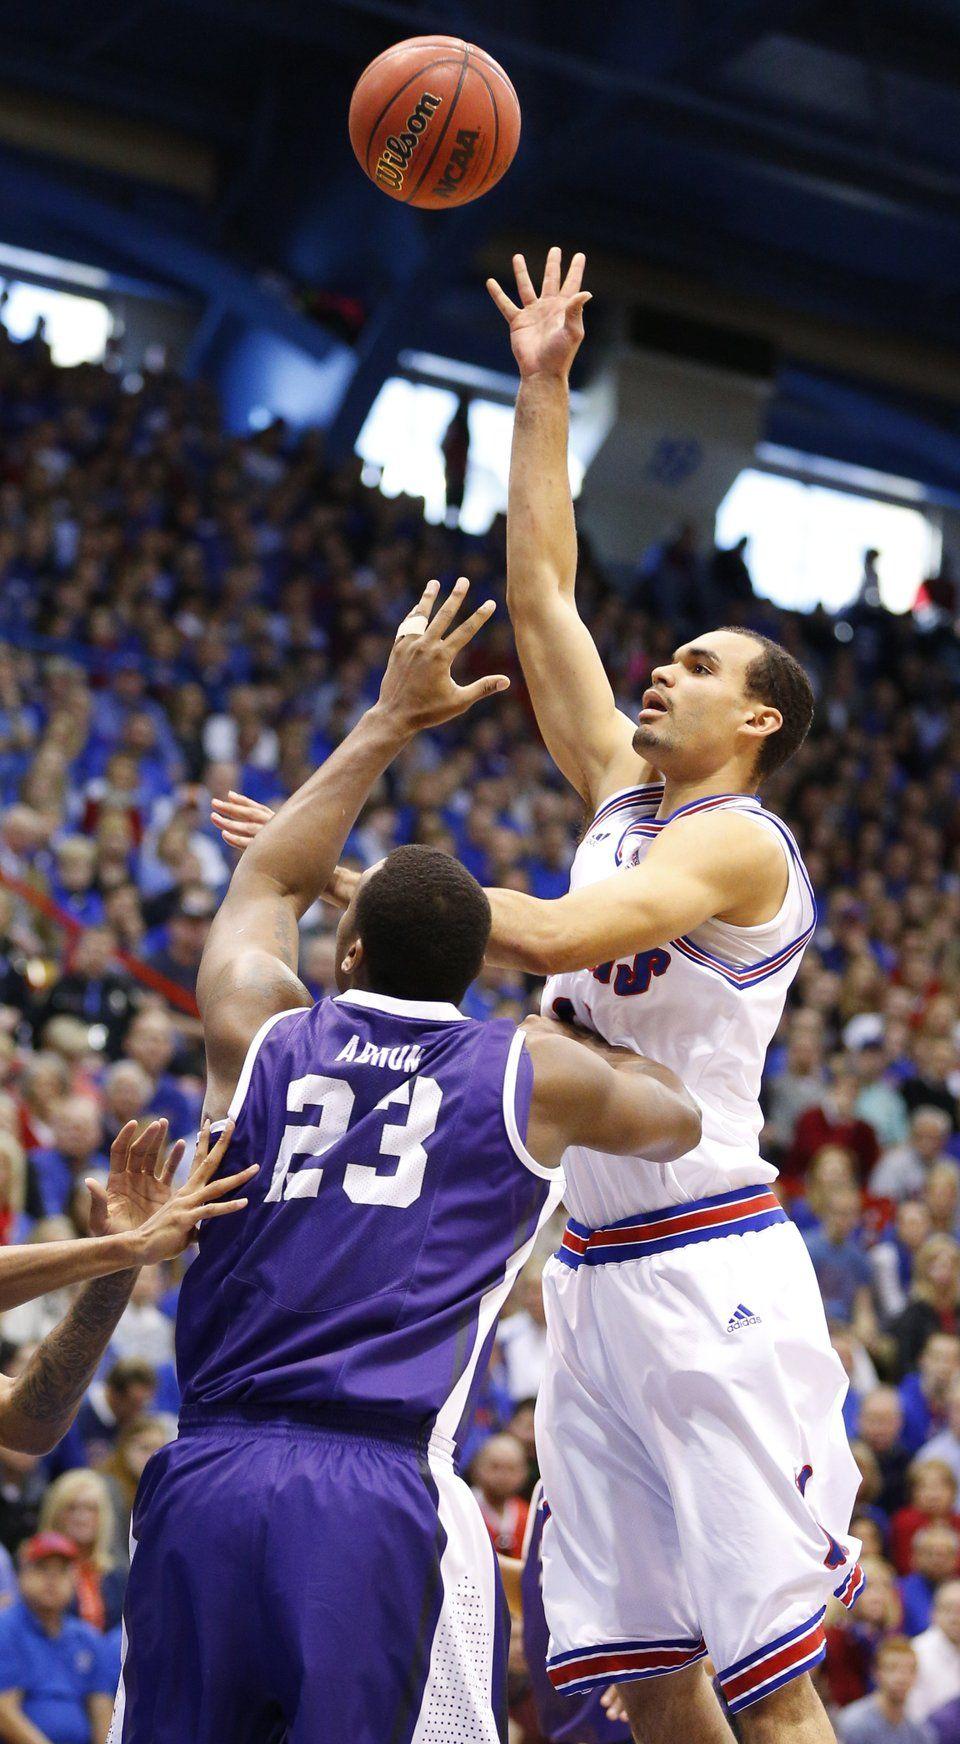 Gallery photo | KUsports.com | Kansas basketball, Gyms